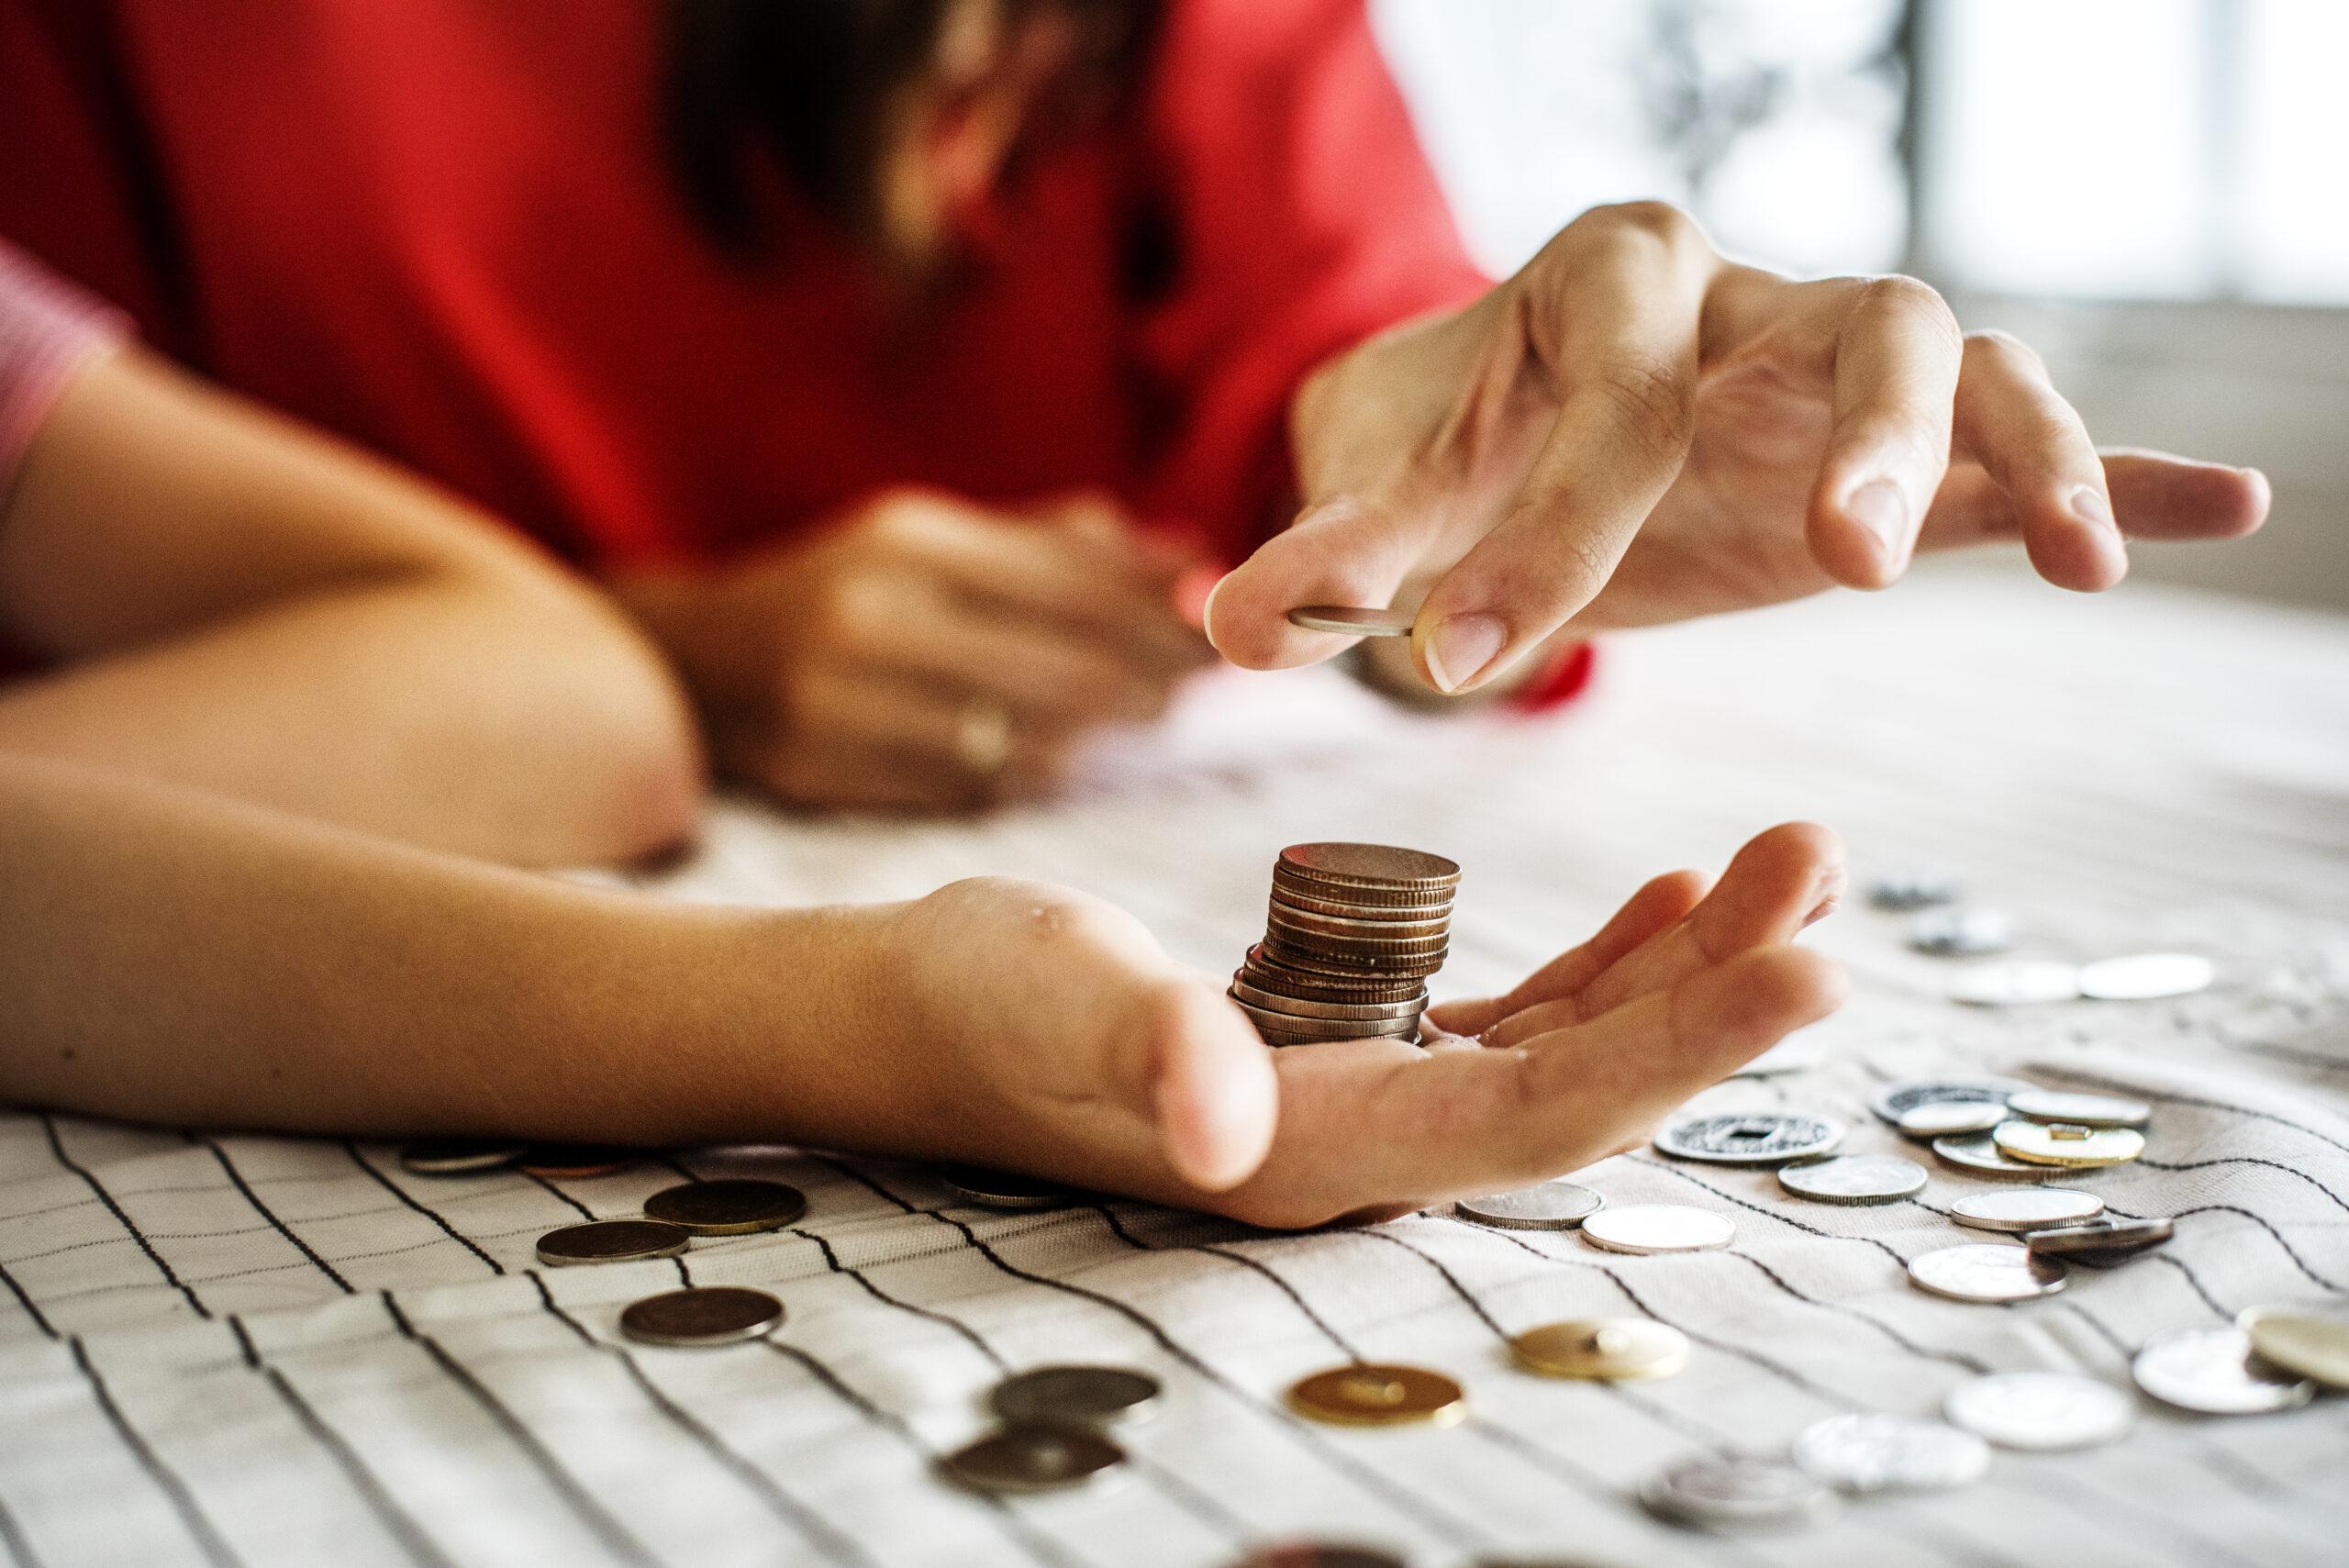 gudagnare con equity crowdfunding